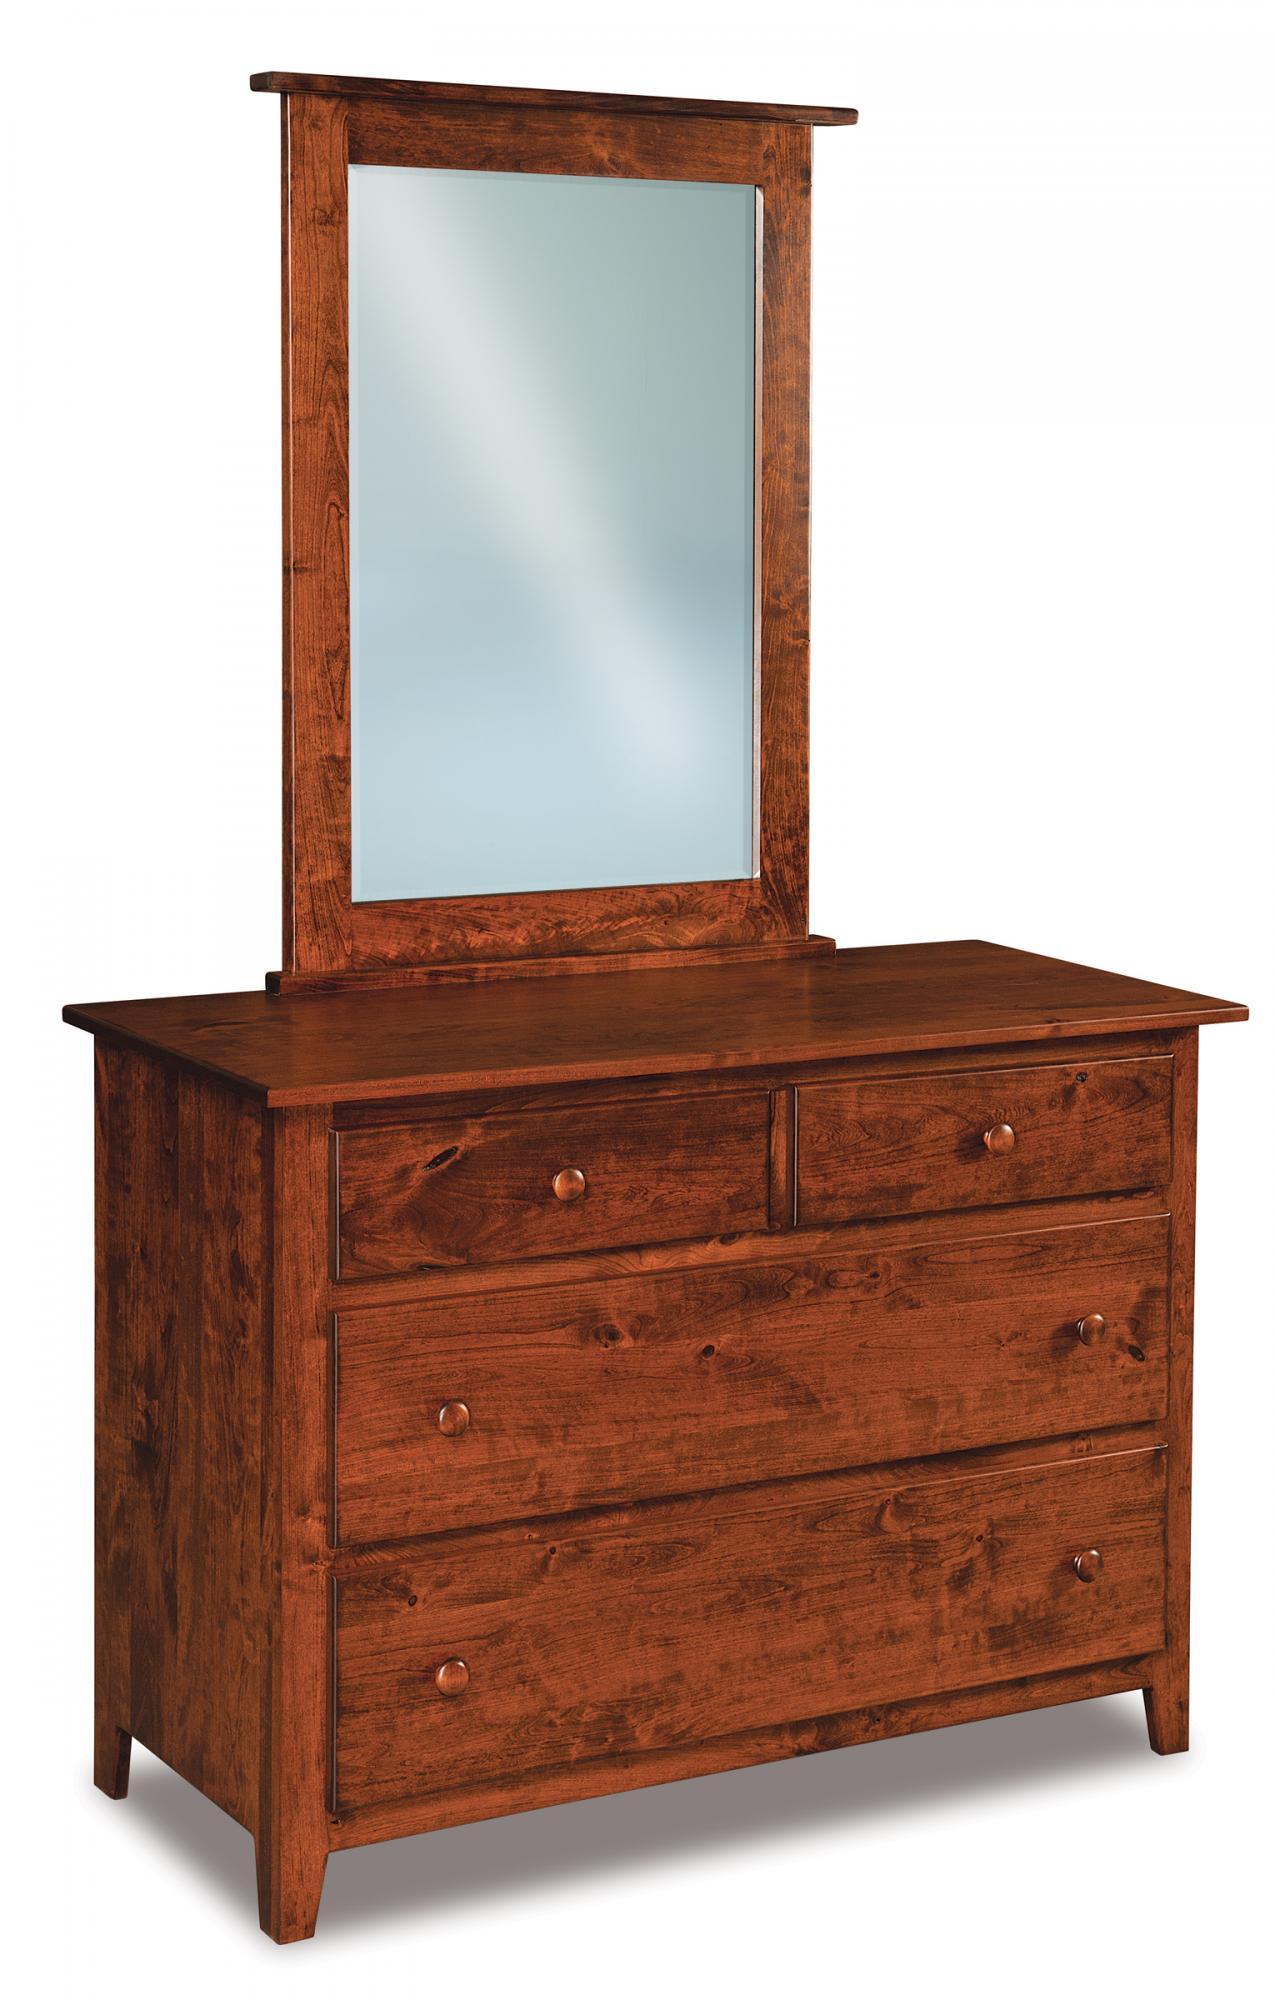 4 Drawer Dresser Amish Furniture Store Mankato MN